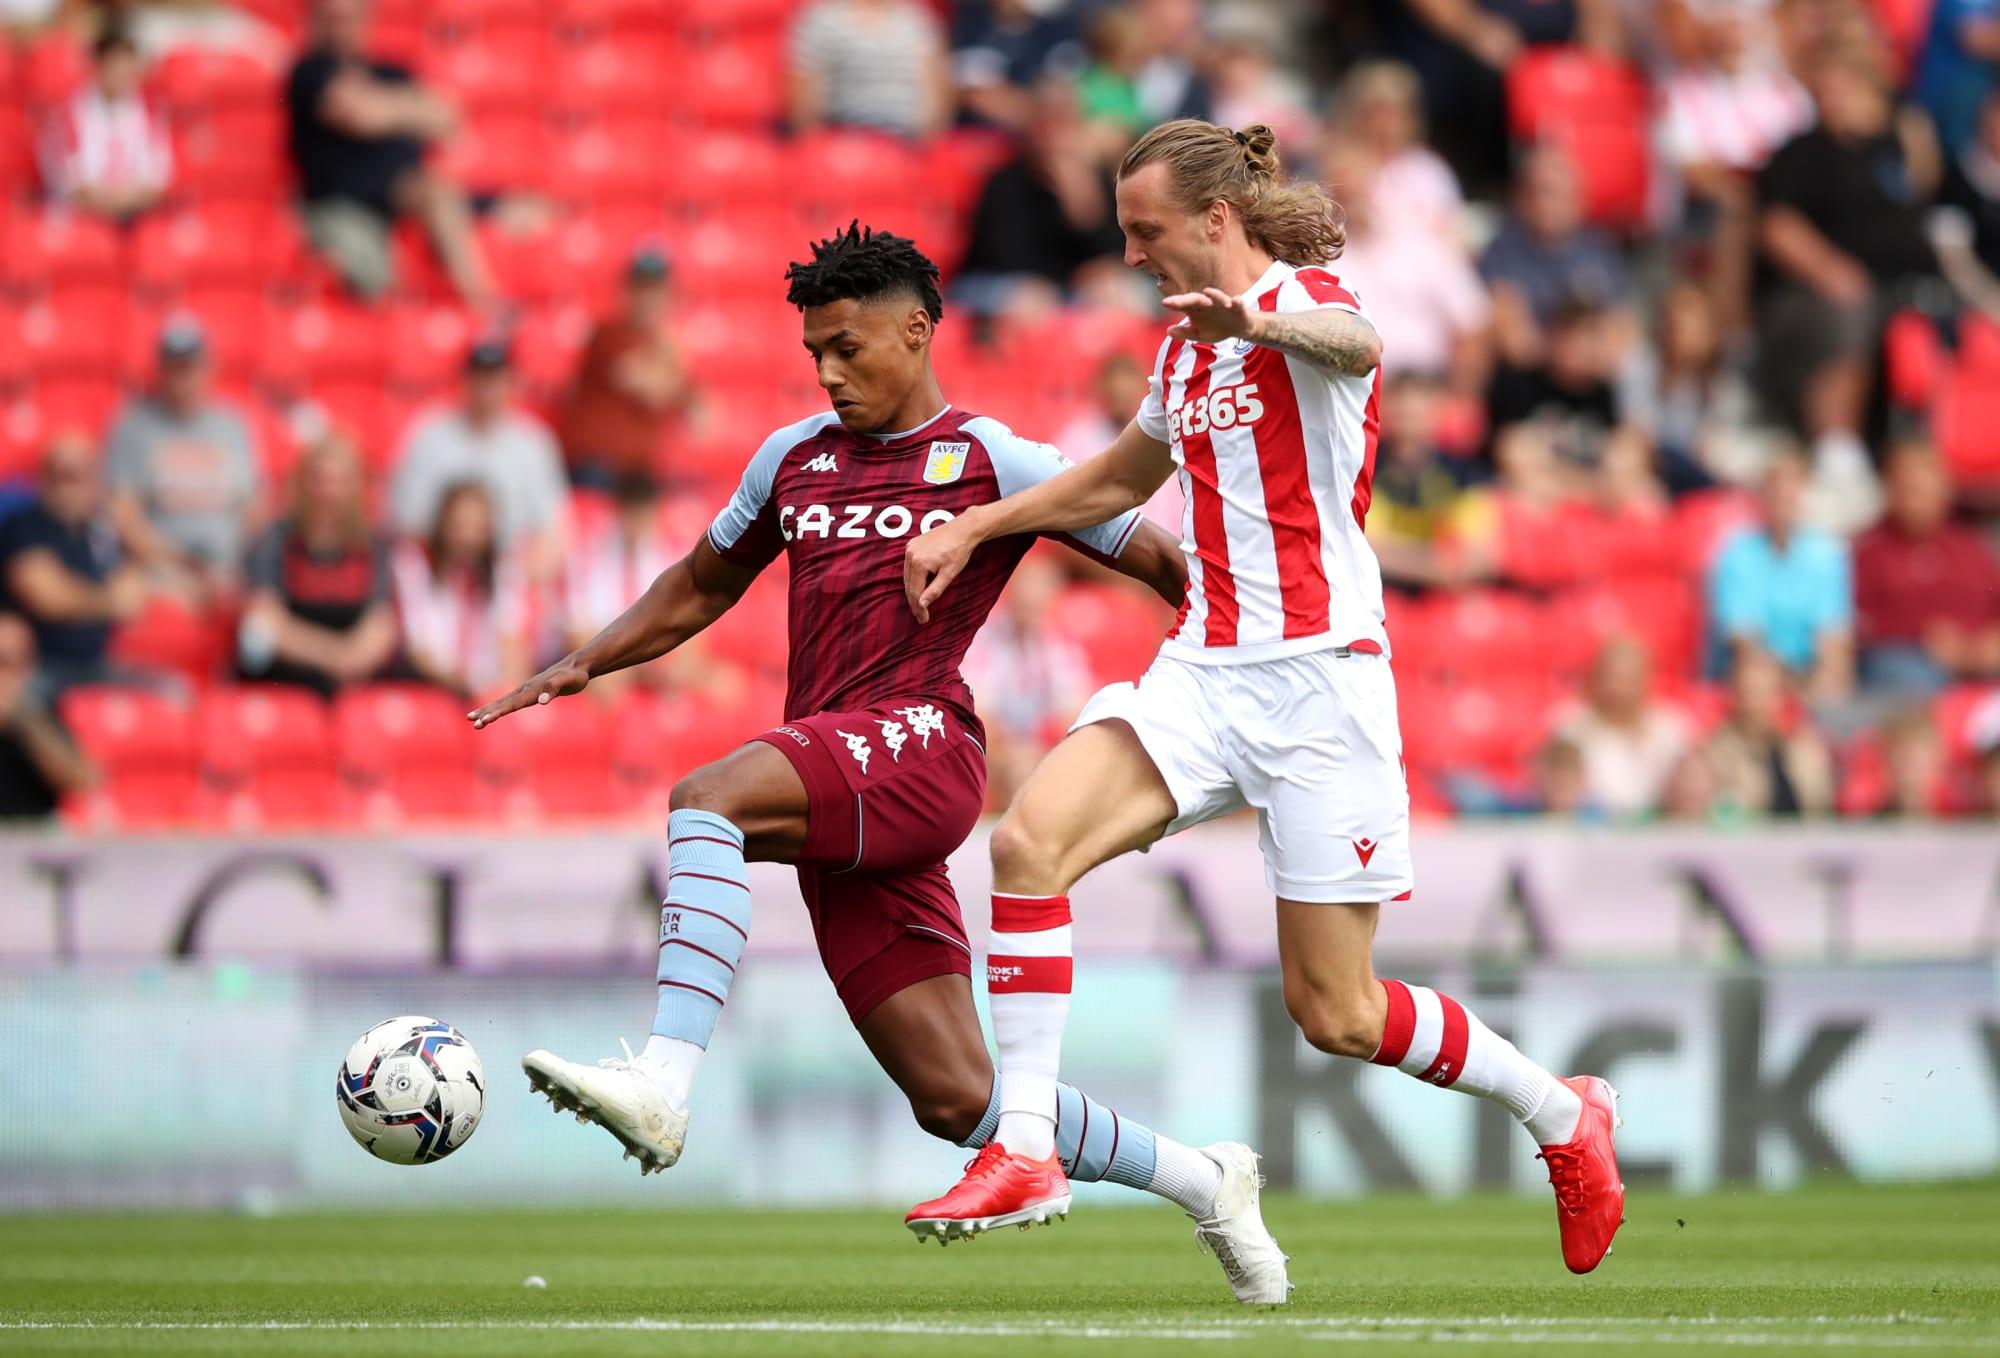 Aston Villa drop preseason fixture at Stoke